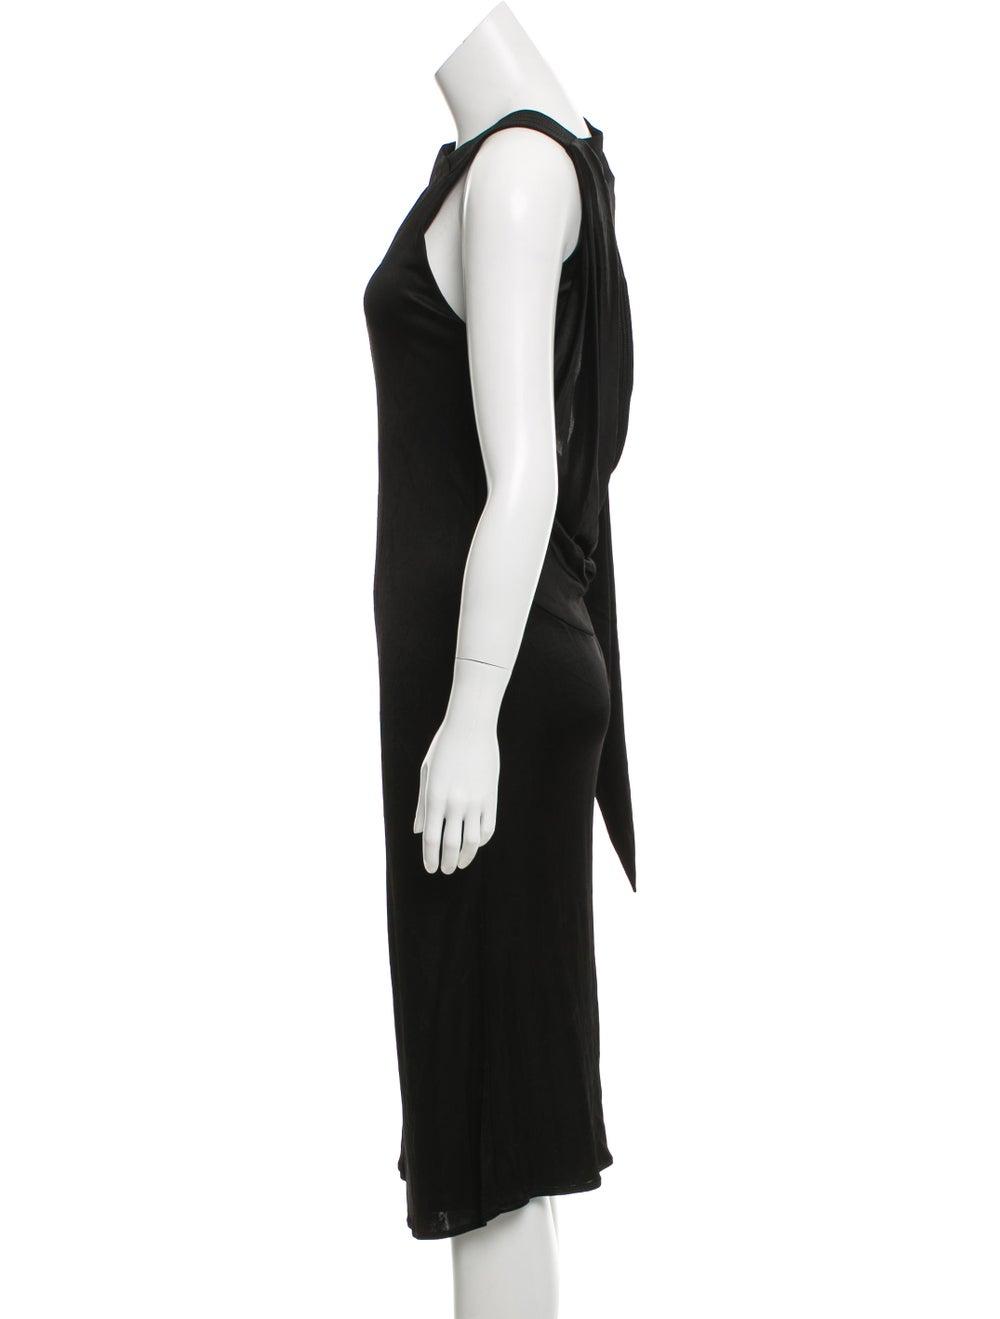 Atlein Draped Open Back Dress Black - image 2